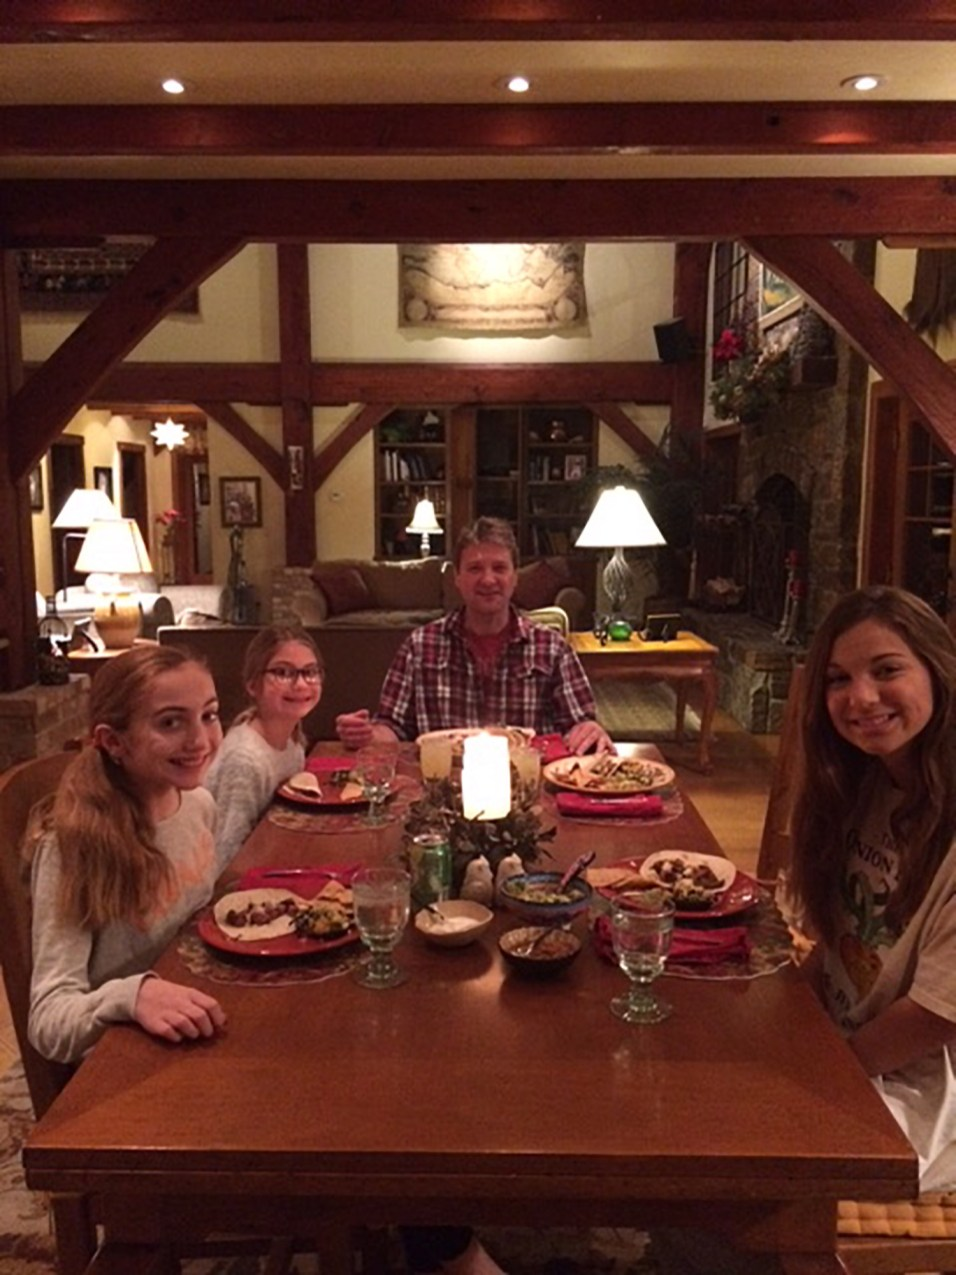 Heinen's Sunday Supper - Kainz Family Recipes